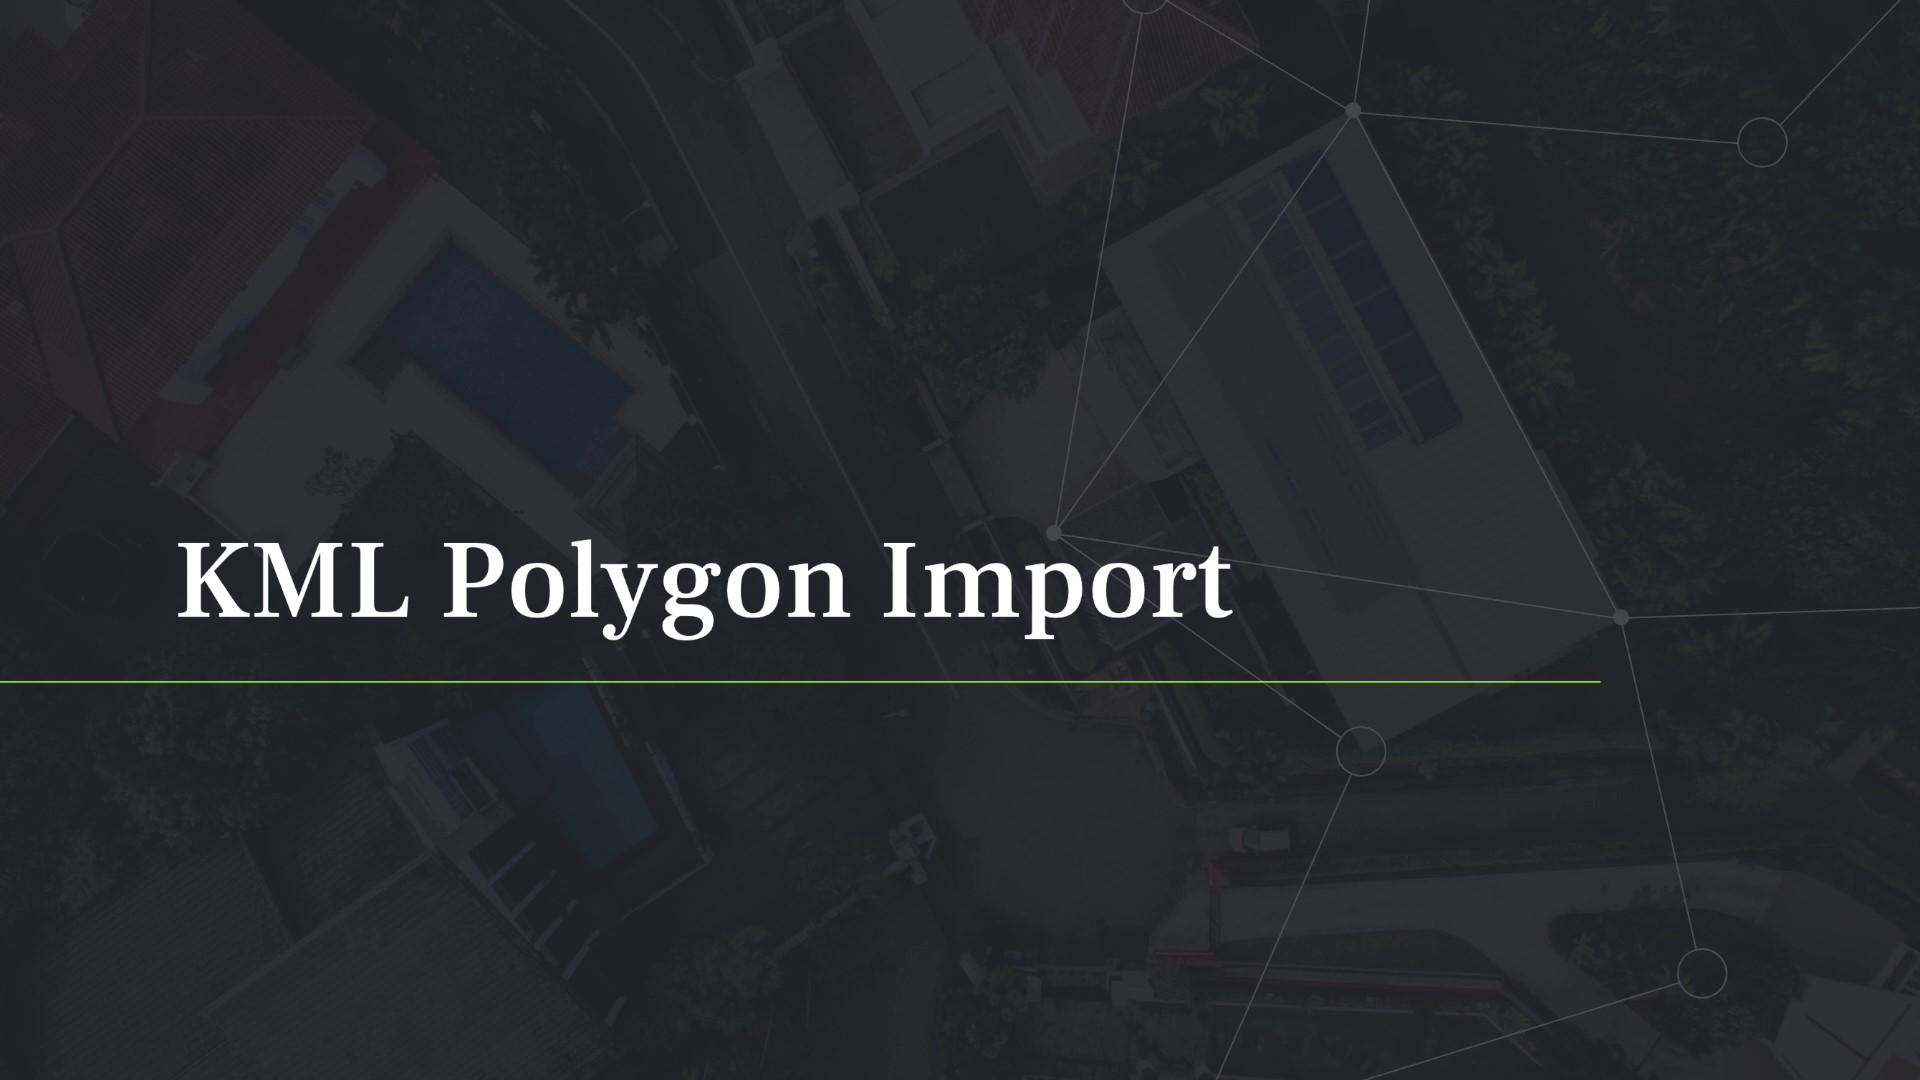 MGC Polygon Import